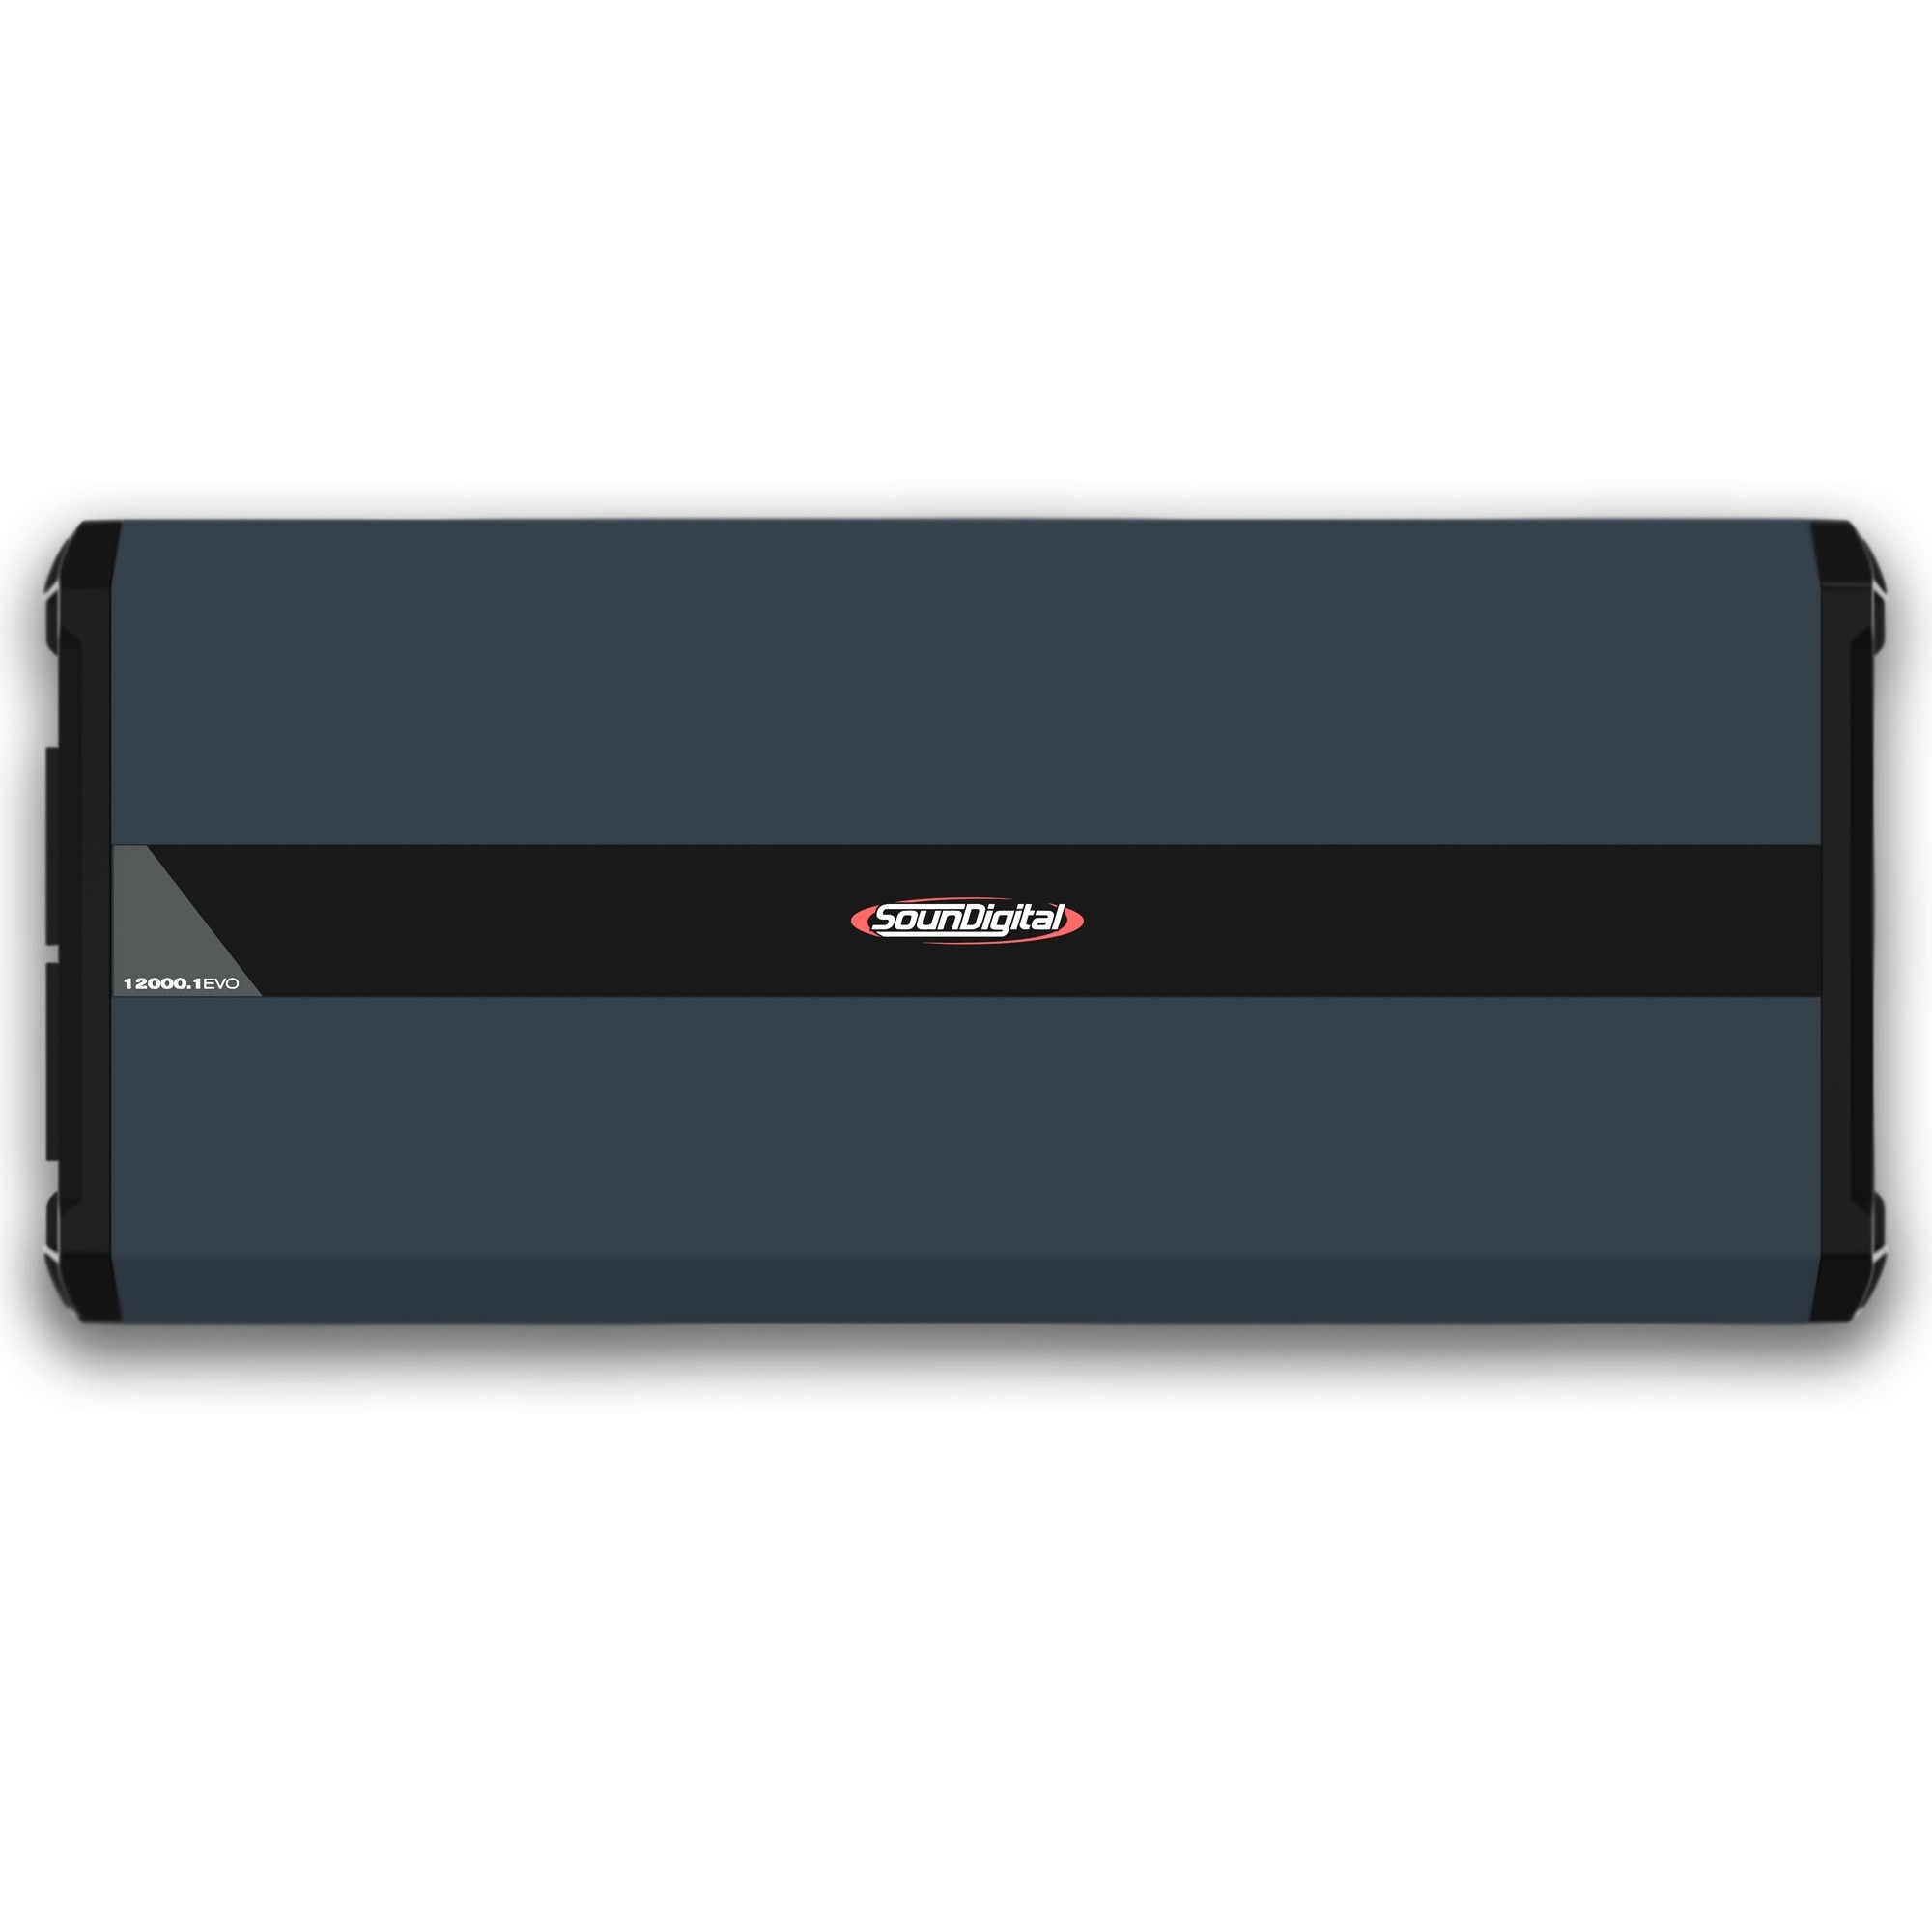 Módulo Amplificador Soundigital SD 12000.1 EVO 4.0 12000W Rms 1 Ohms 1 Canal